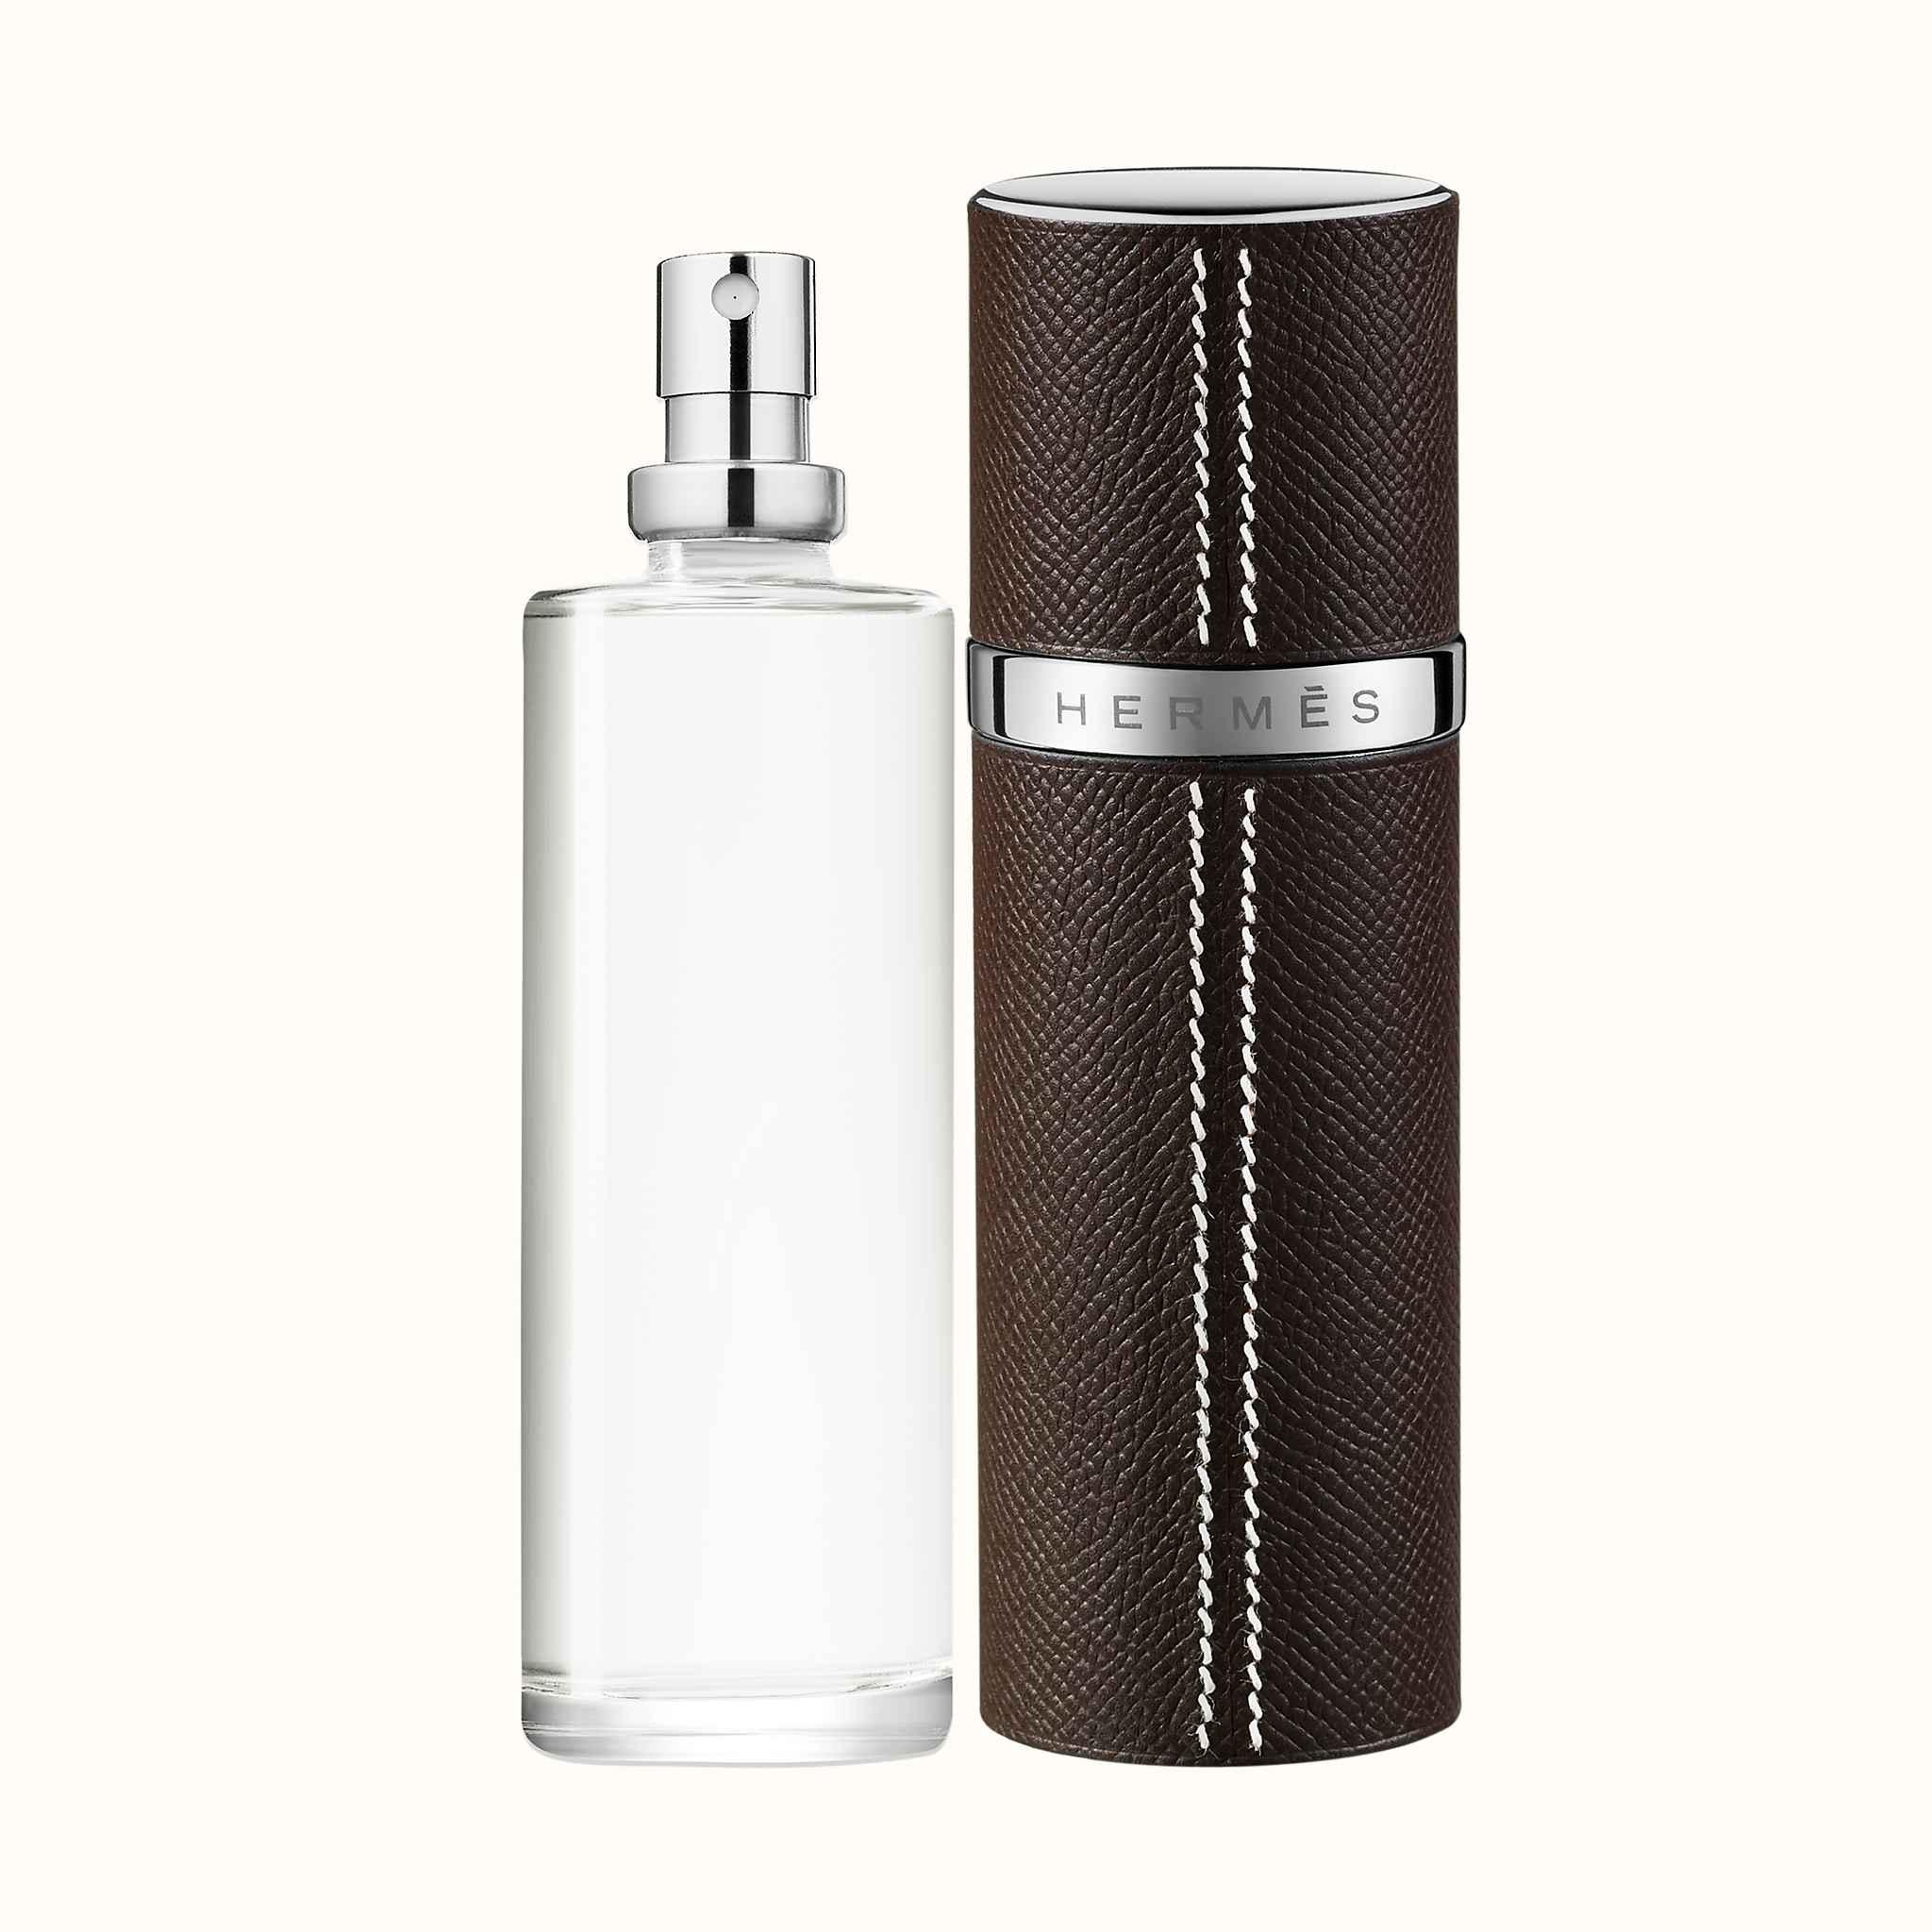 Parfum Leather Refillamp; Voyage Refillable D'hermes Case LVSzpUMqGj